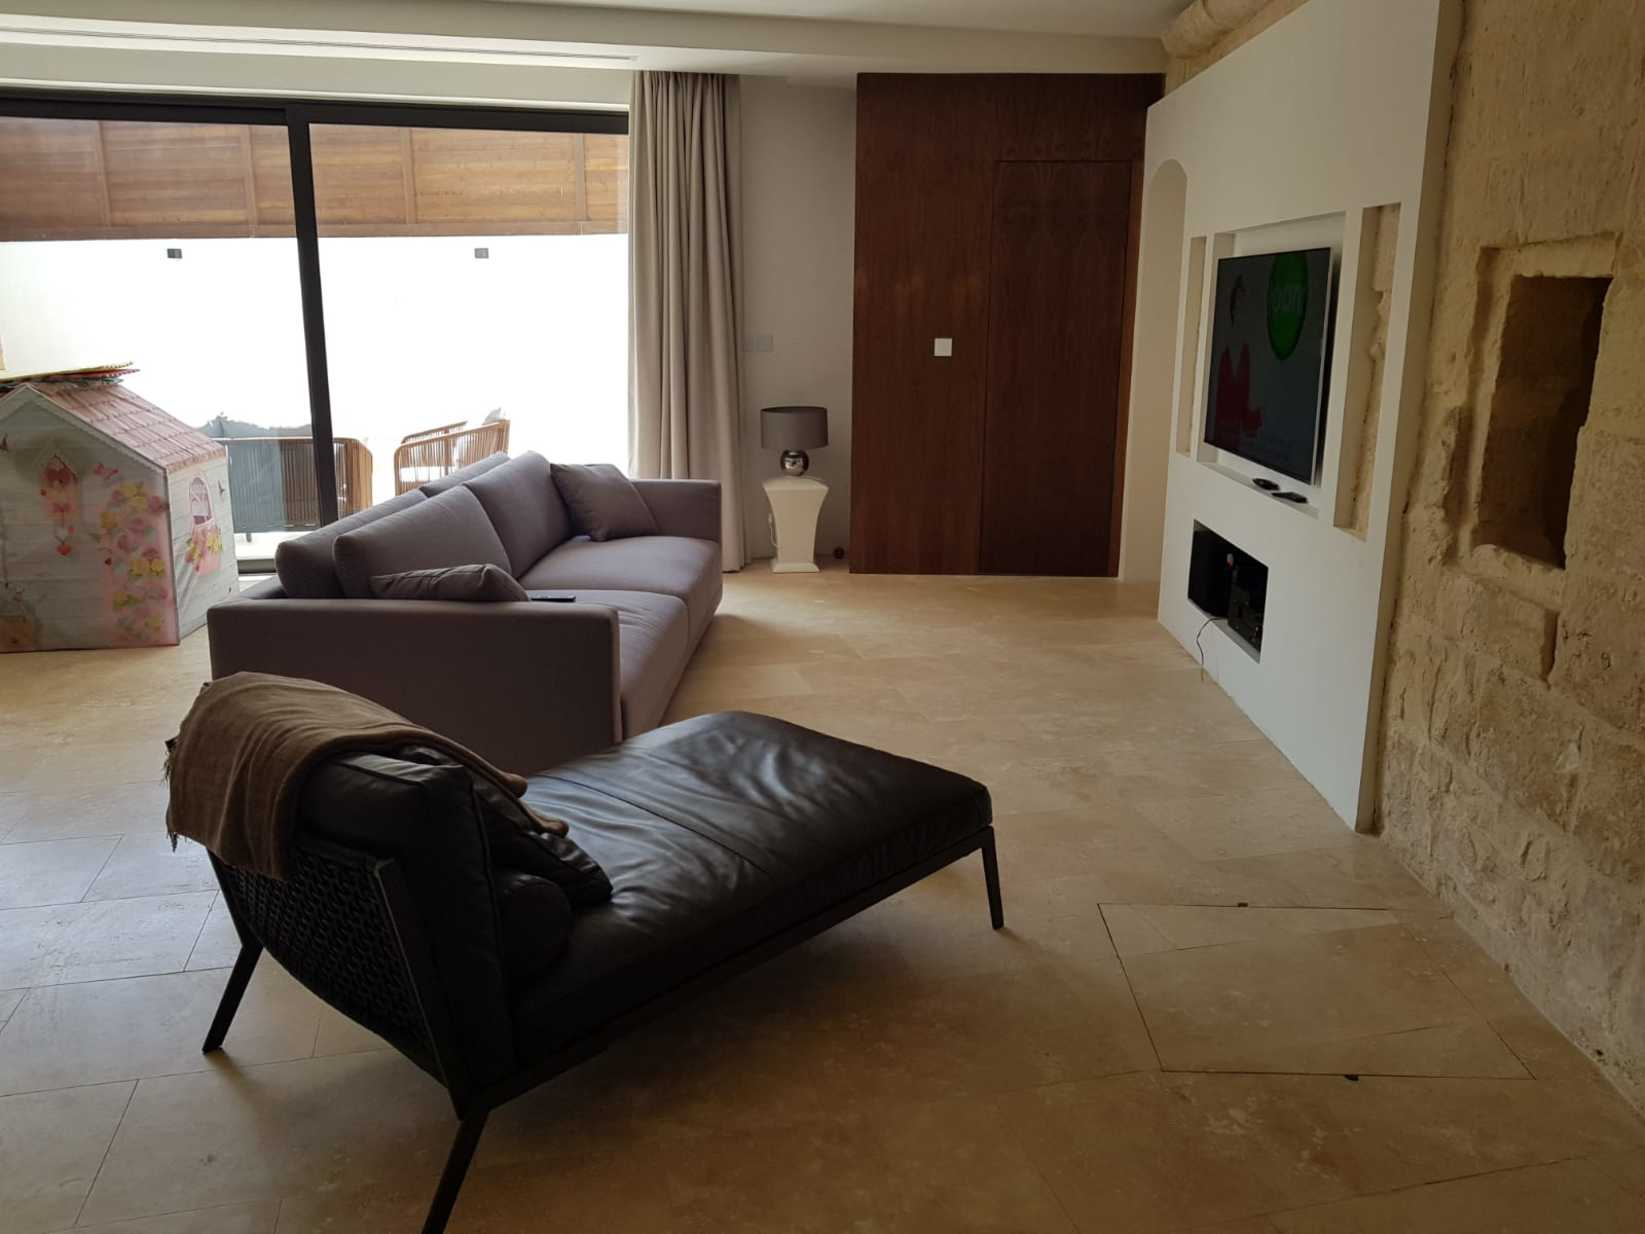 4 bed Villa For Sale in Gharghur, Gharghur - thumb 3